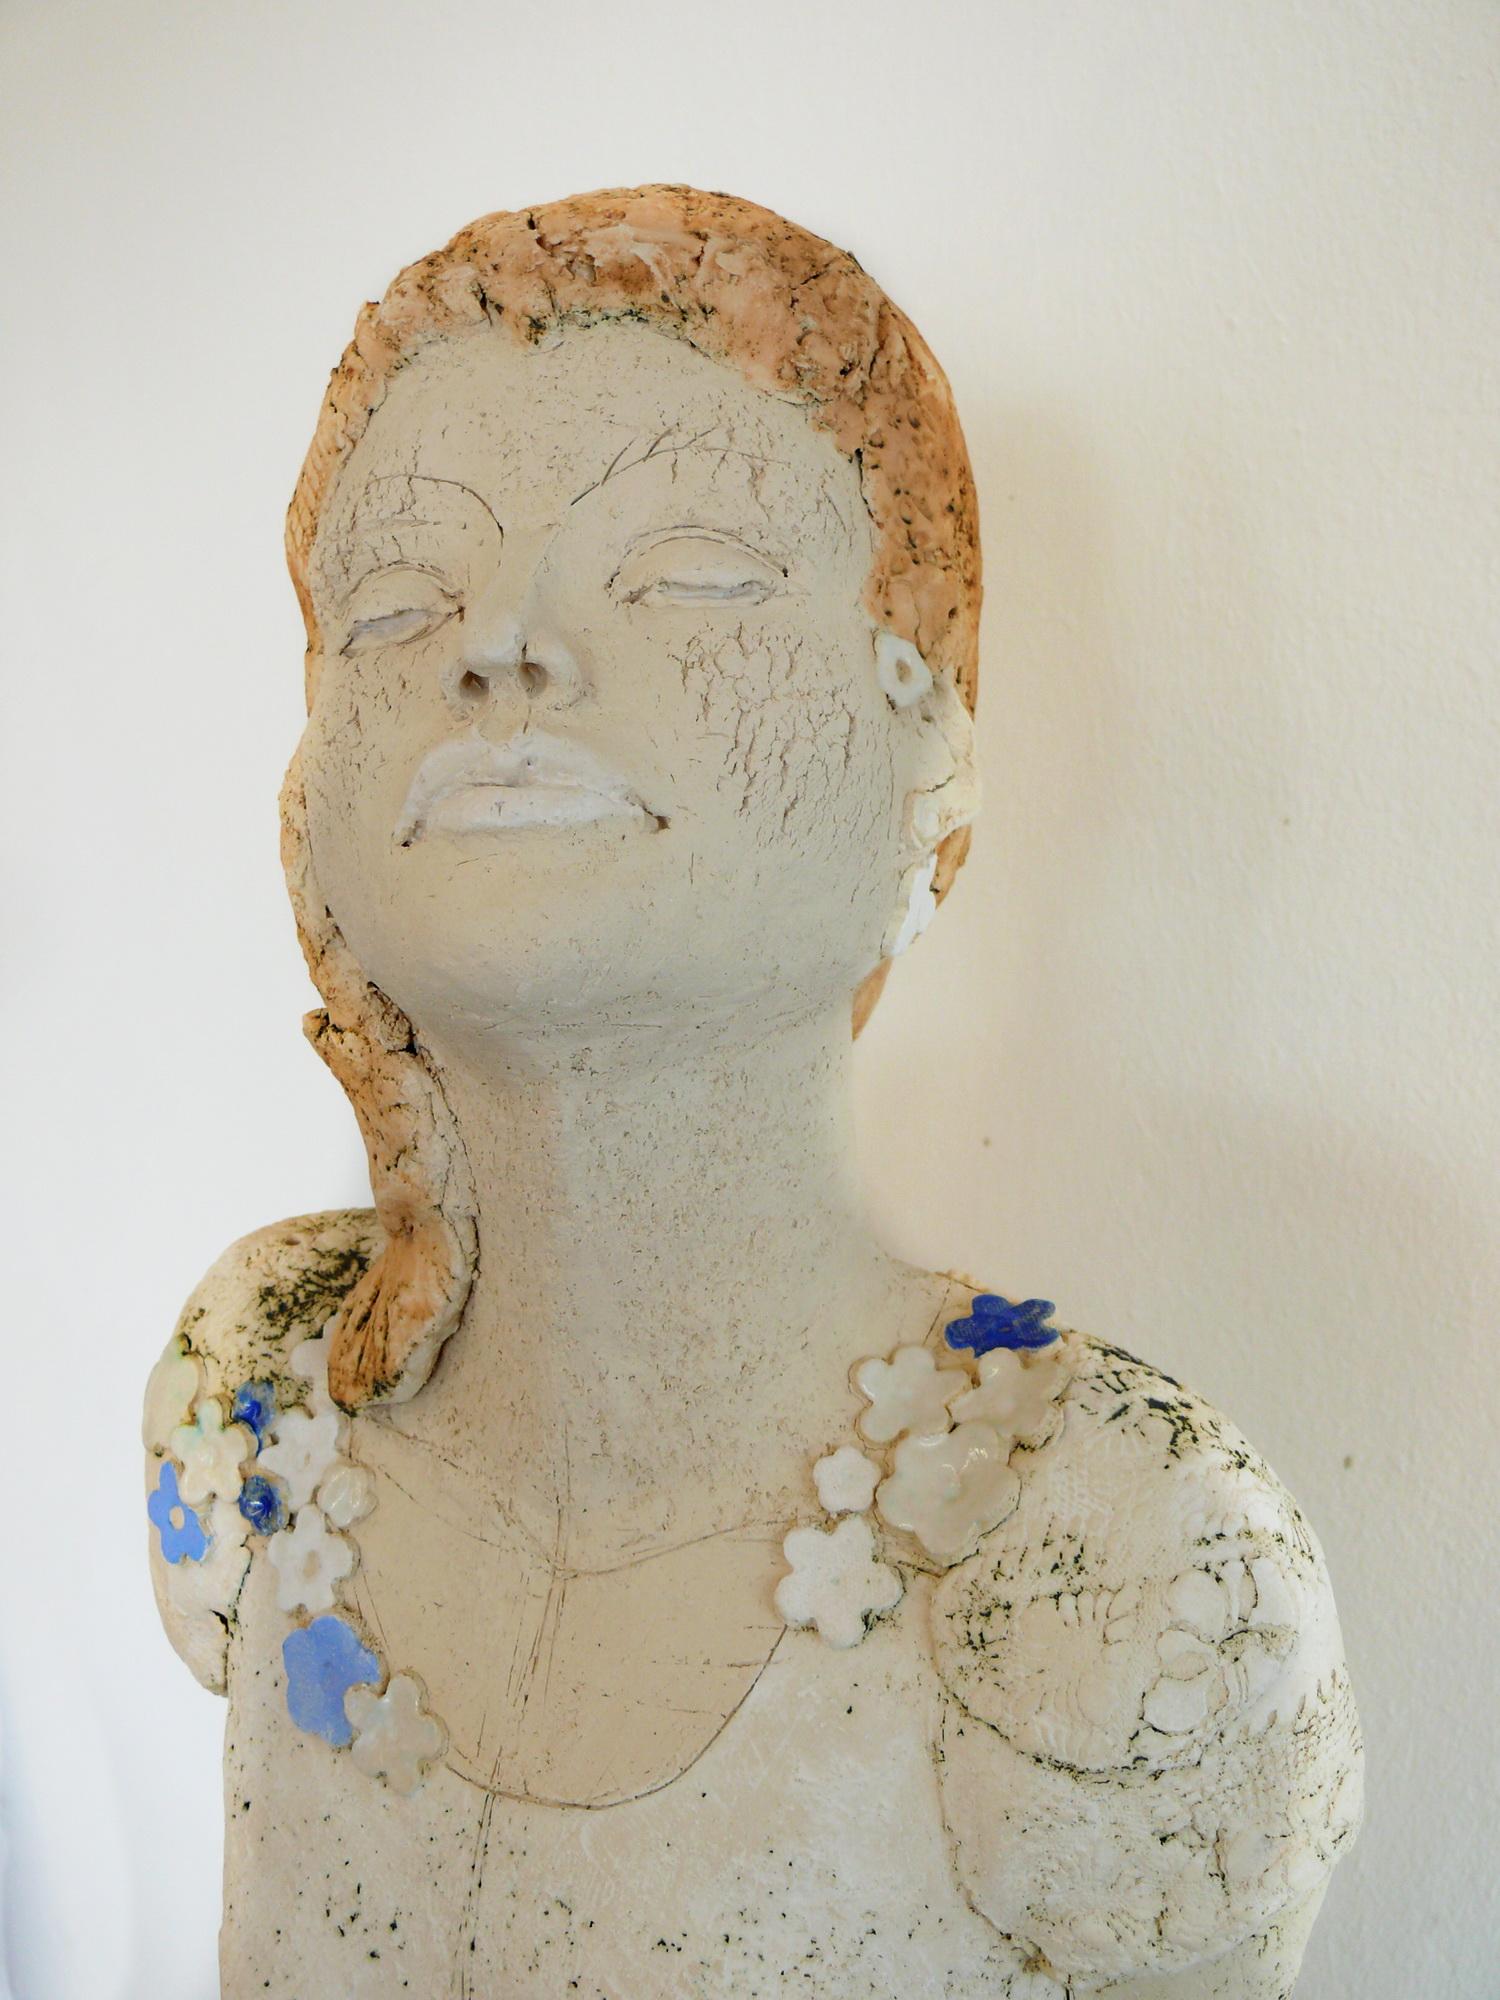 Skulptur Aus Keramik Imagine 105 Cm Gaby Puhmeyer Gaby Puhmeyer